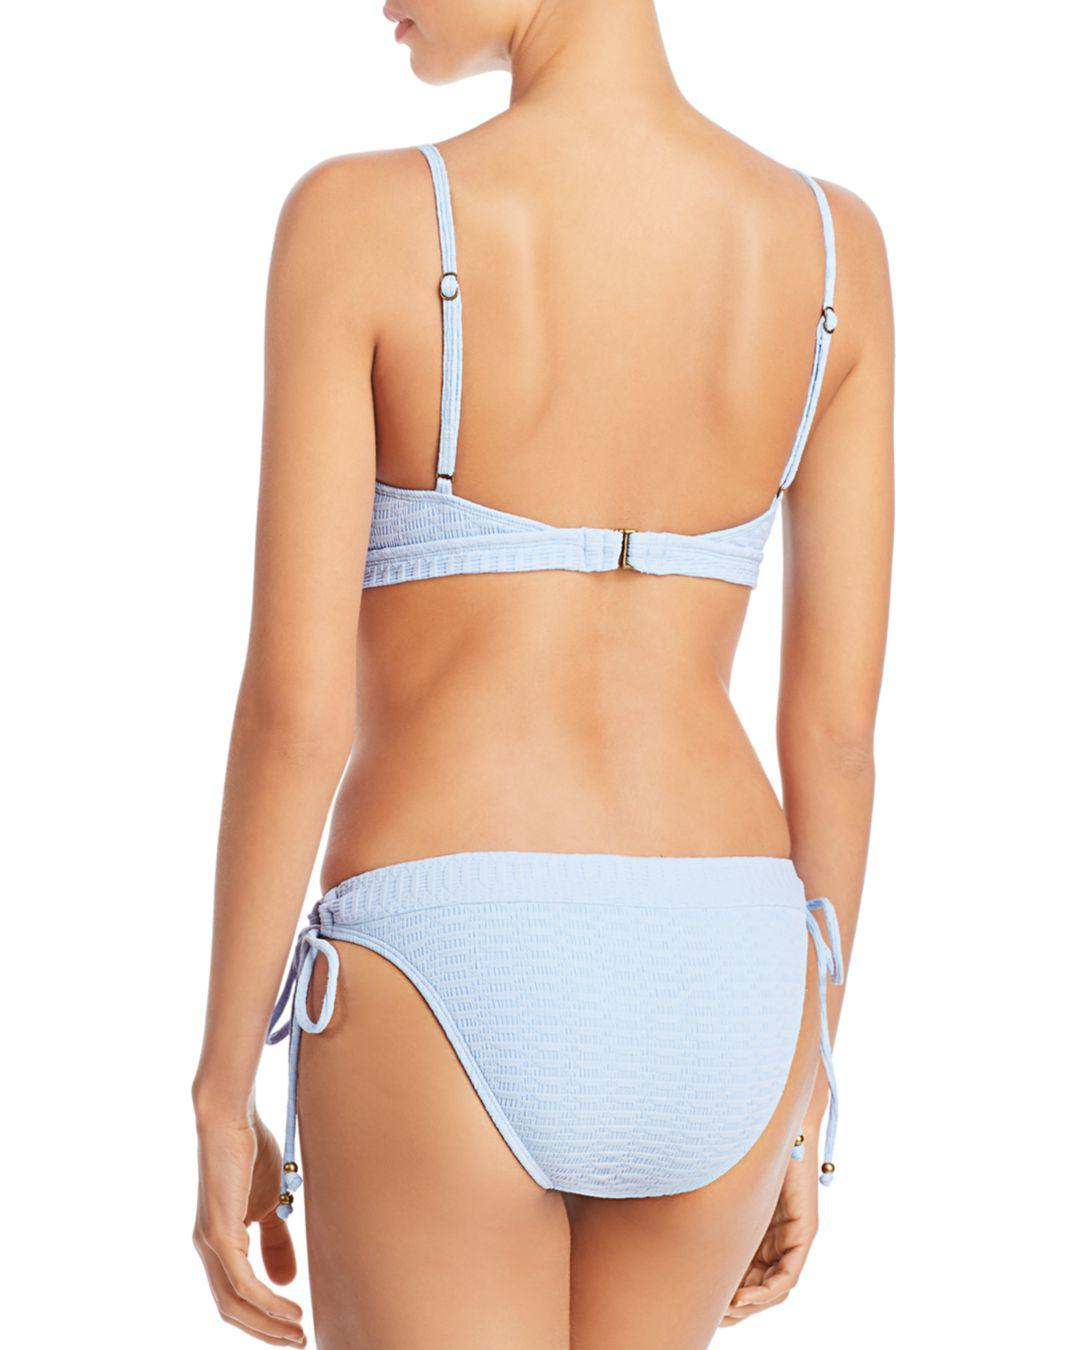 cc78daae45d10 Lyst - Lucky Brand Shoreline Chic Hoop Hipster Bikini Bottom in Blue